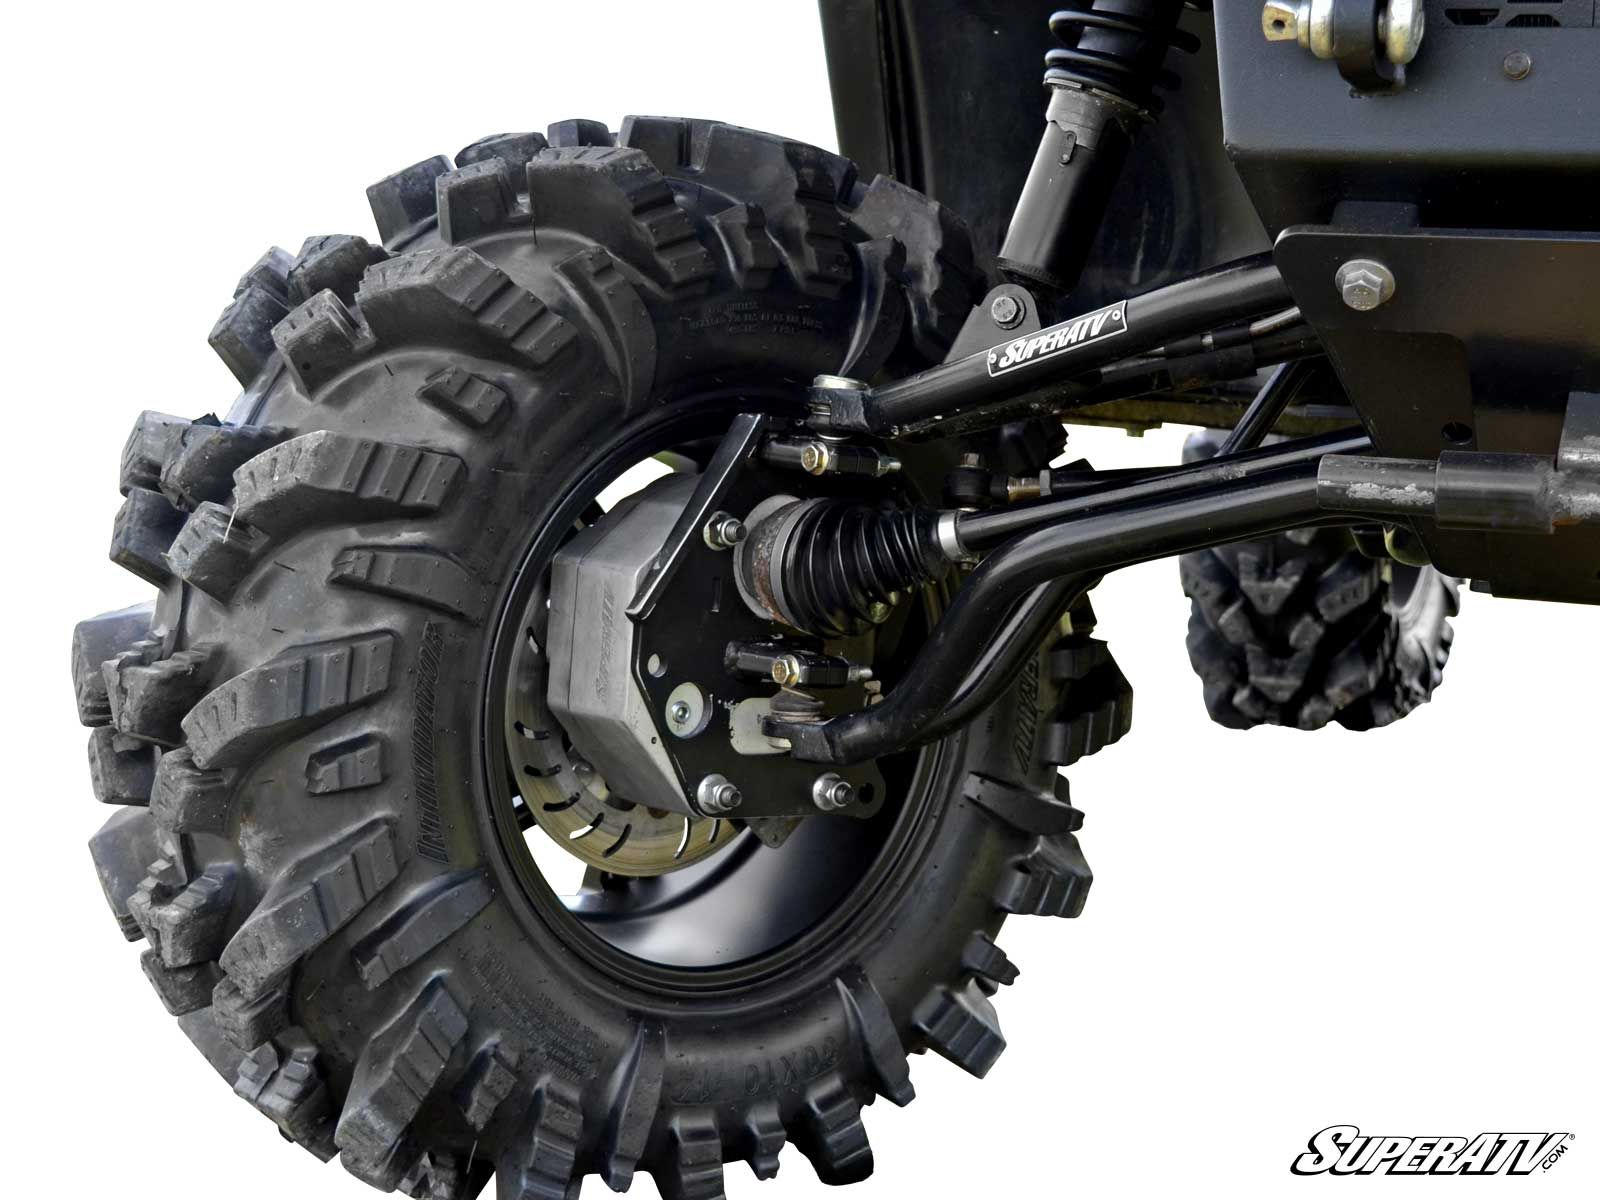 Super ATV GDP Polaris Ranger Portal Gear Lift Kits